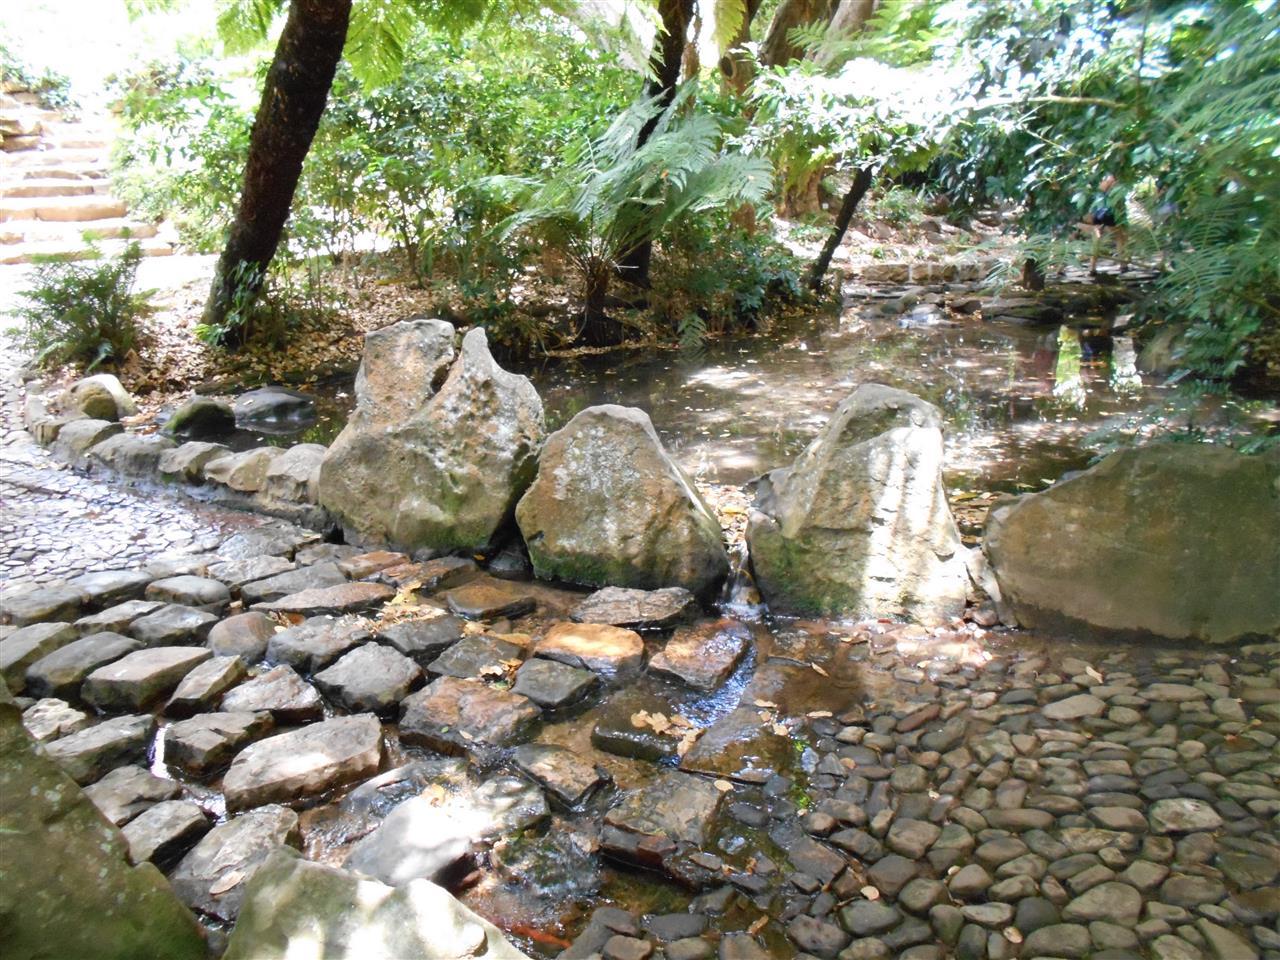 Cape Town, South Africa - stepping stone stream in Kirstenbosch Botanical Gardens